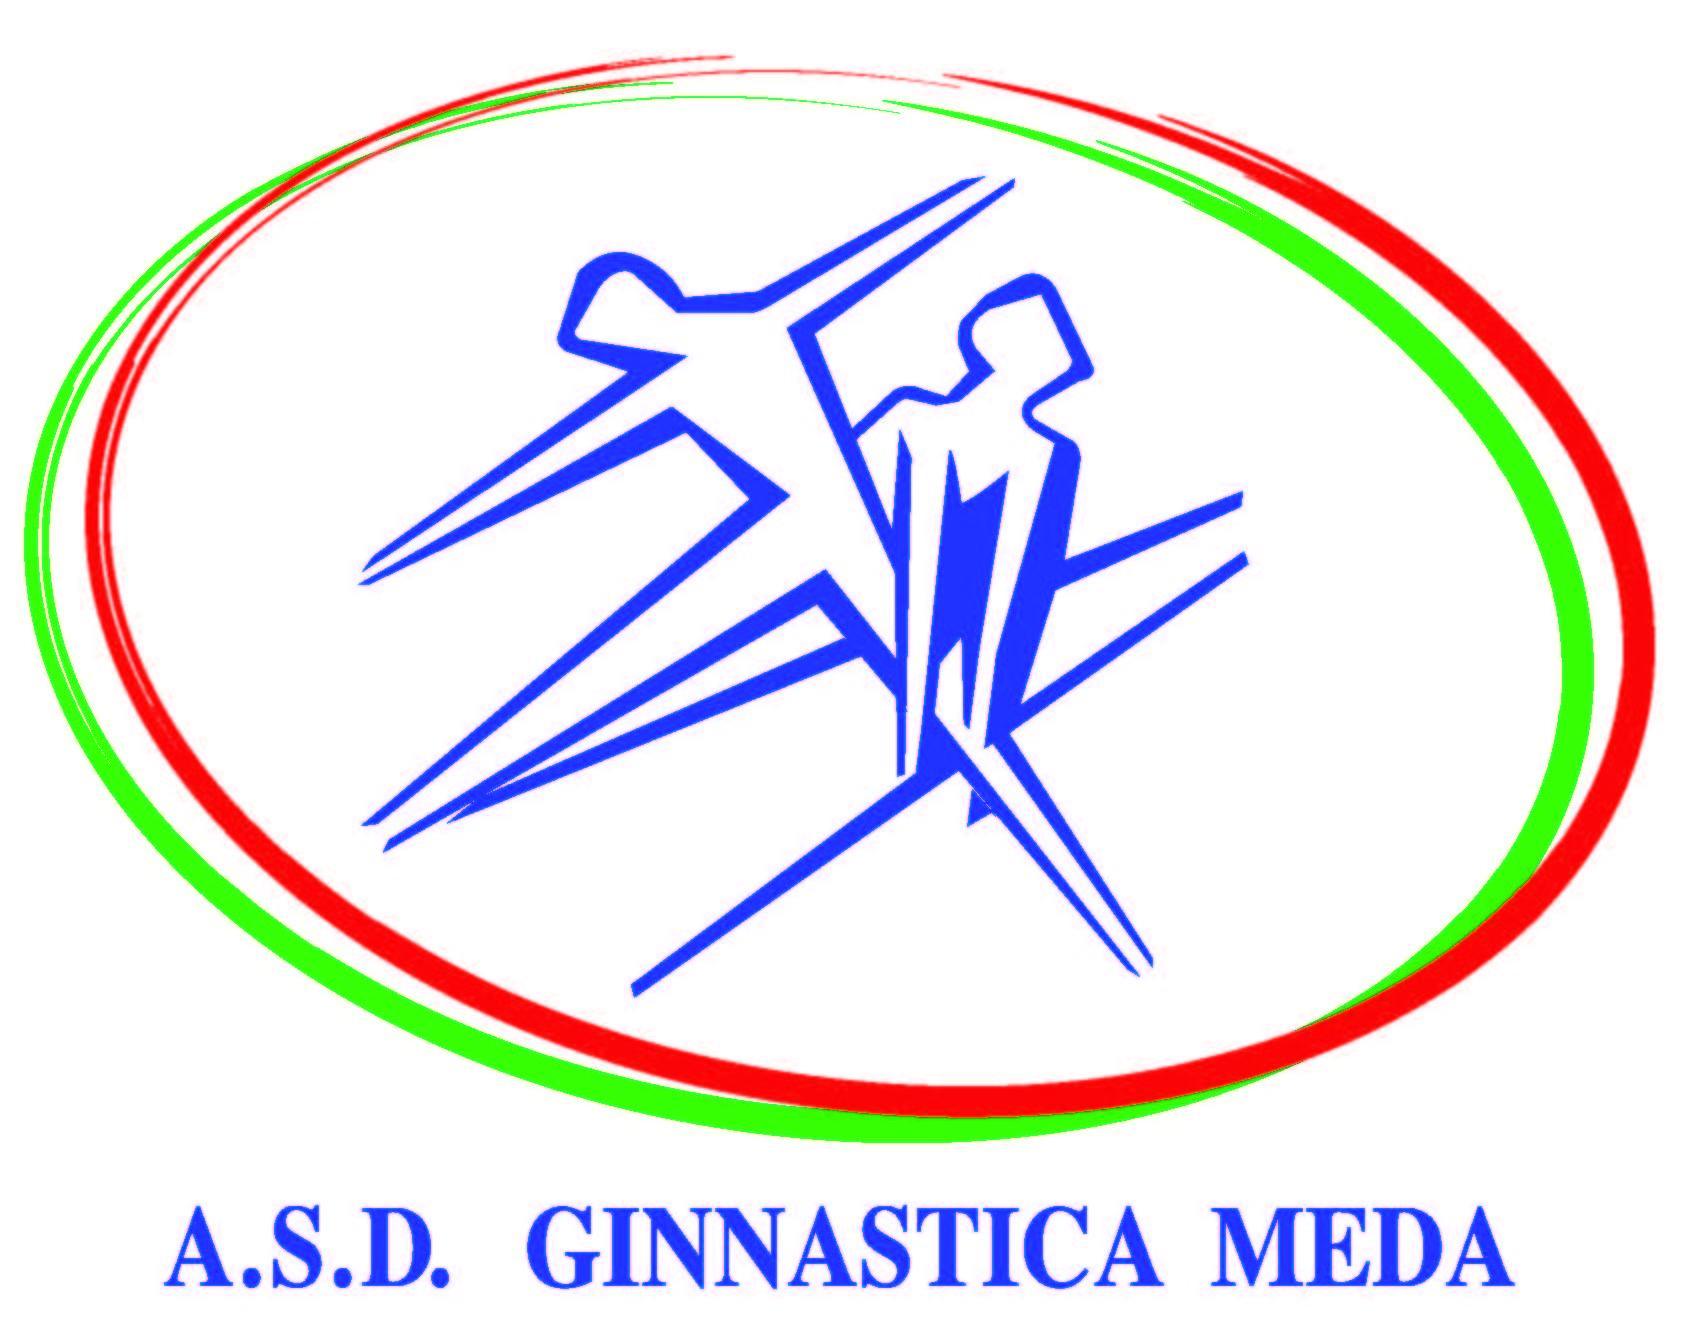 A.S.D. GINNASTICA MEDA